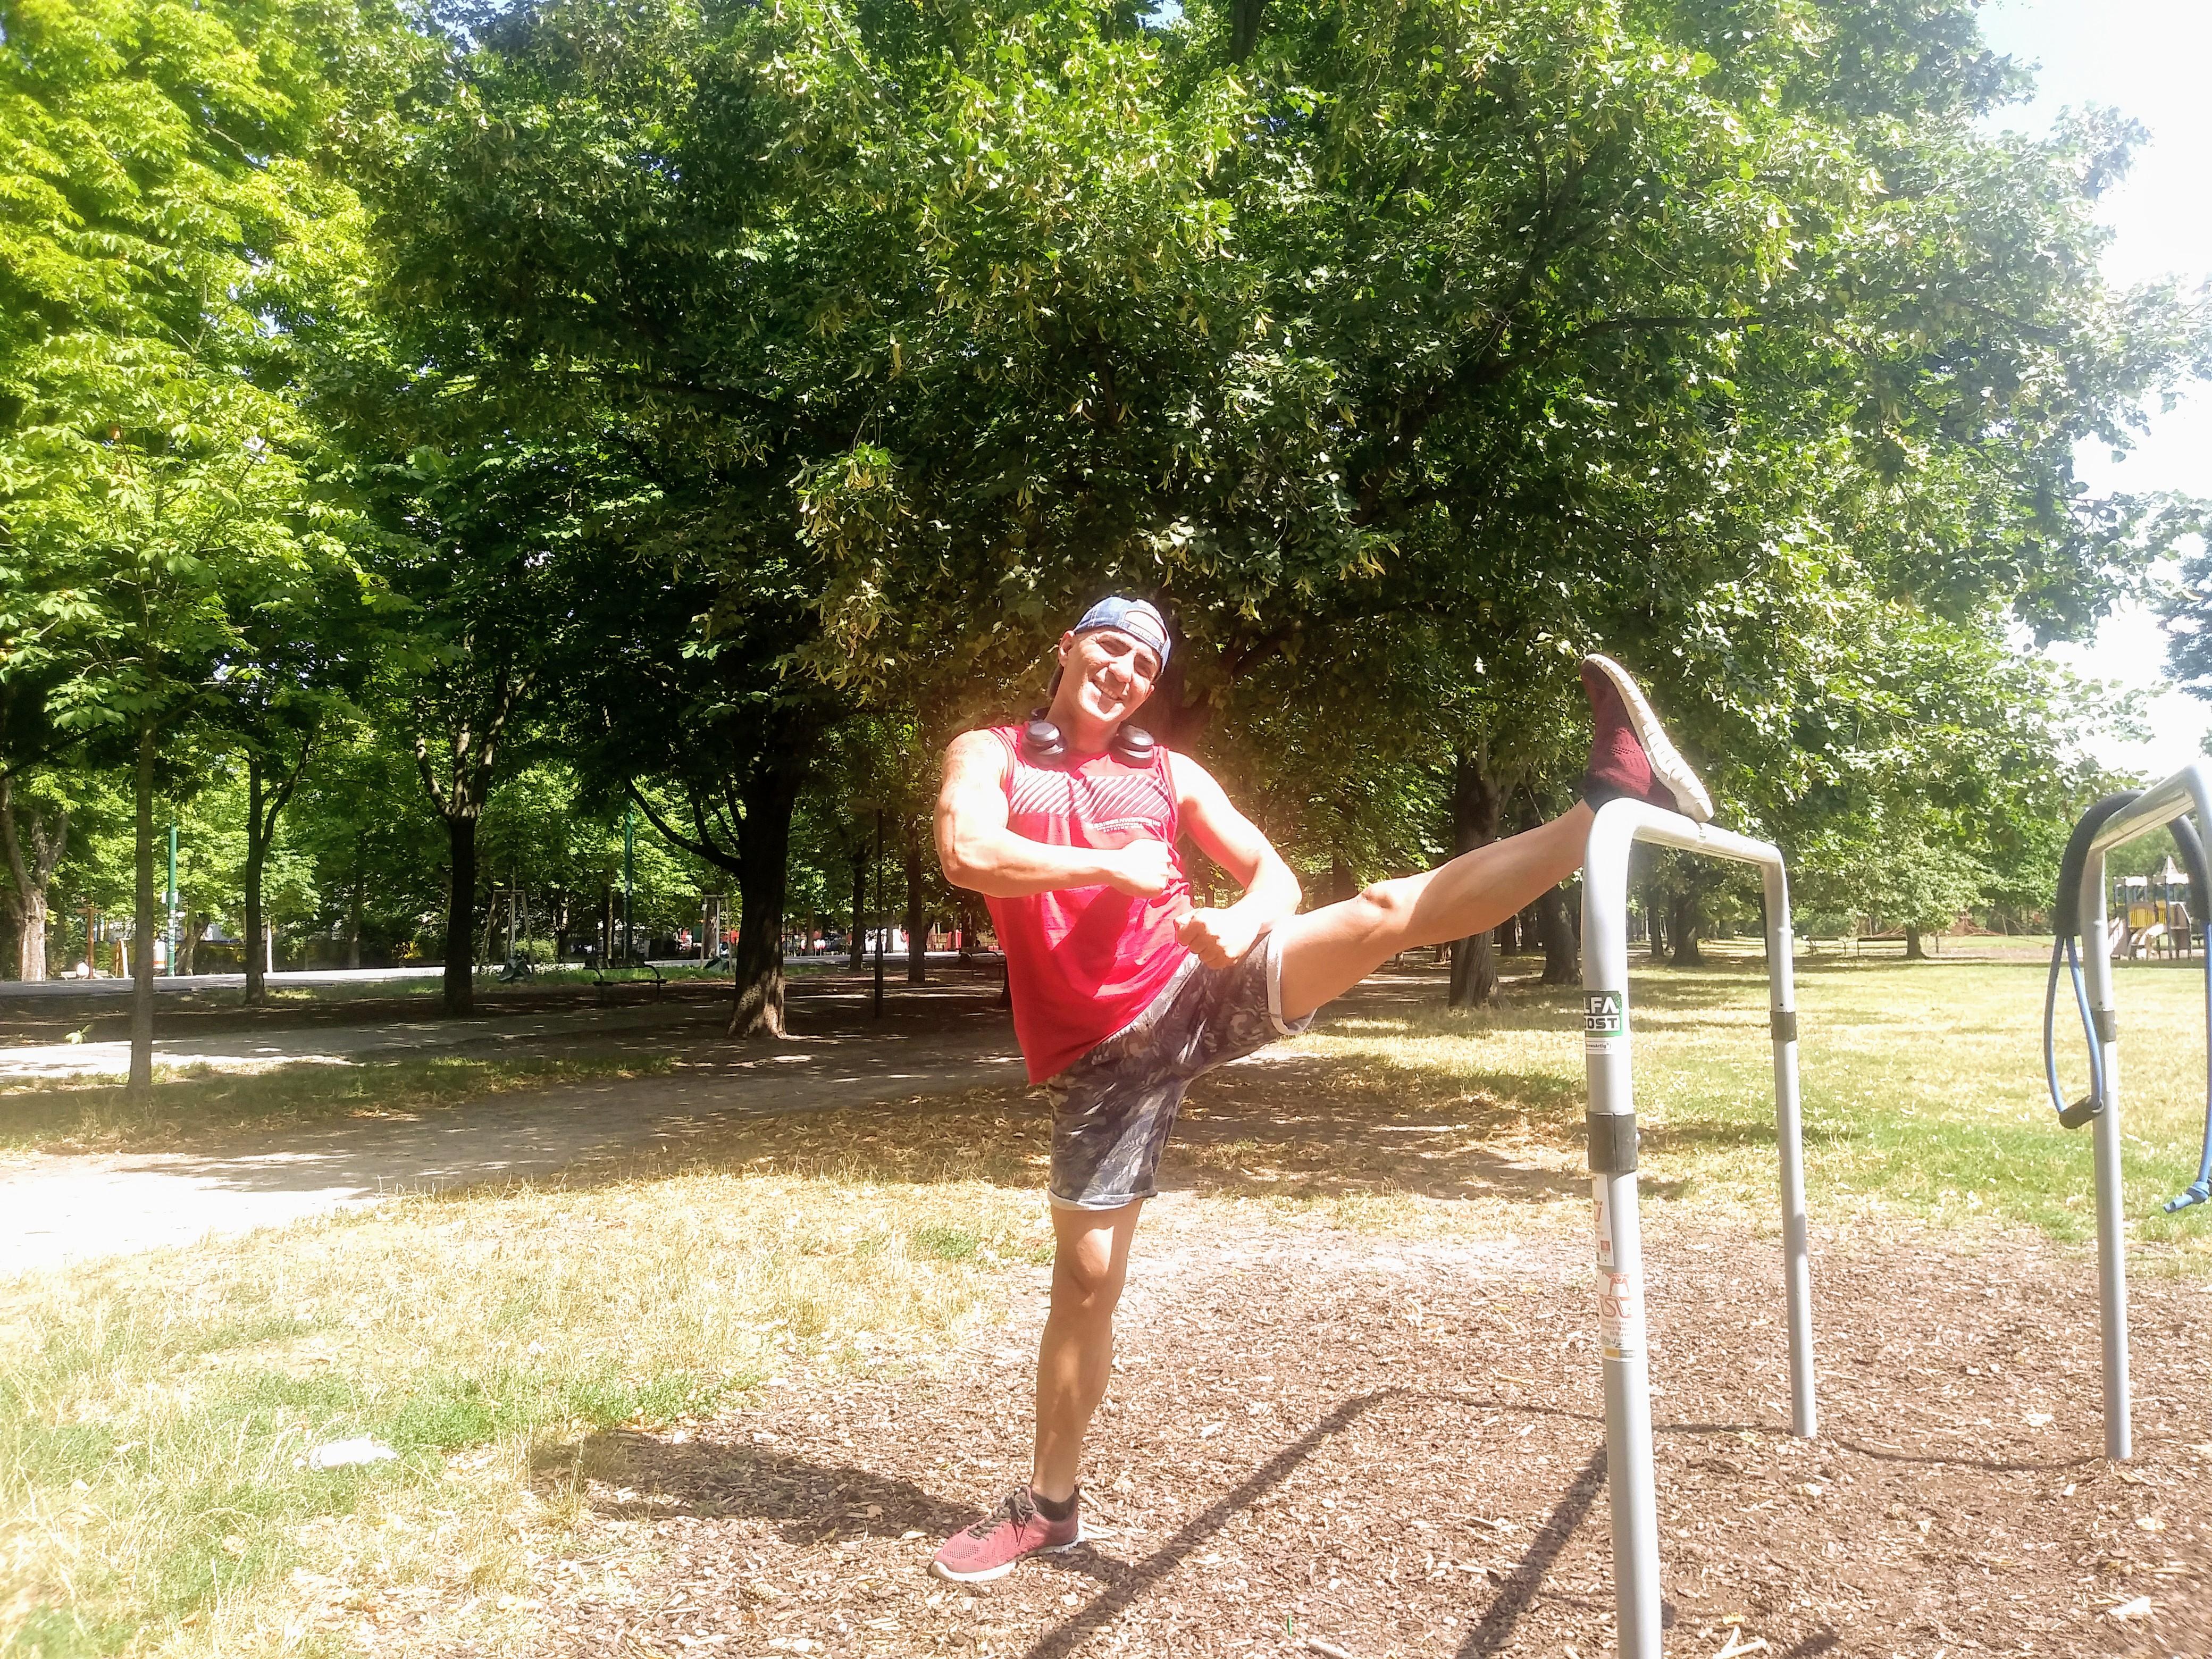 Ali Yaghoubi schätzt den Prater als ideales Sportgebiet